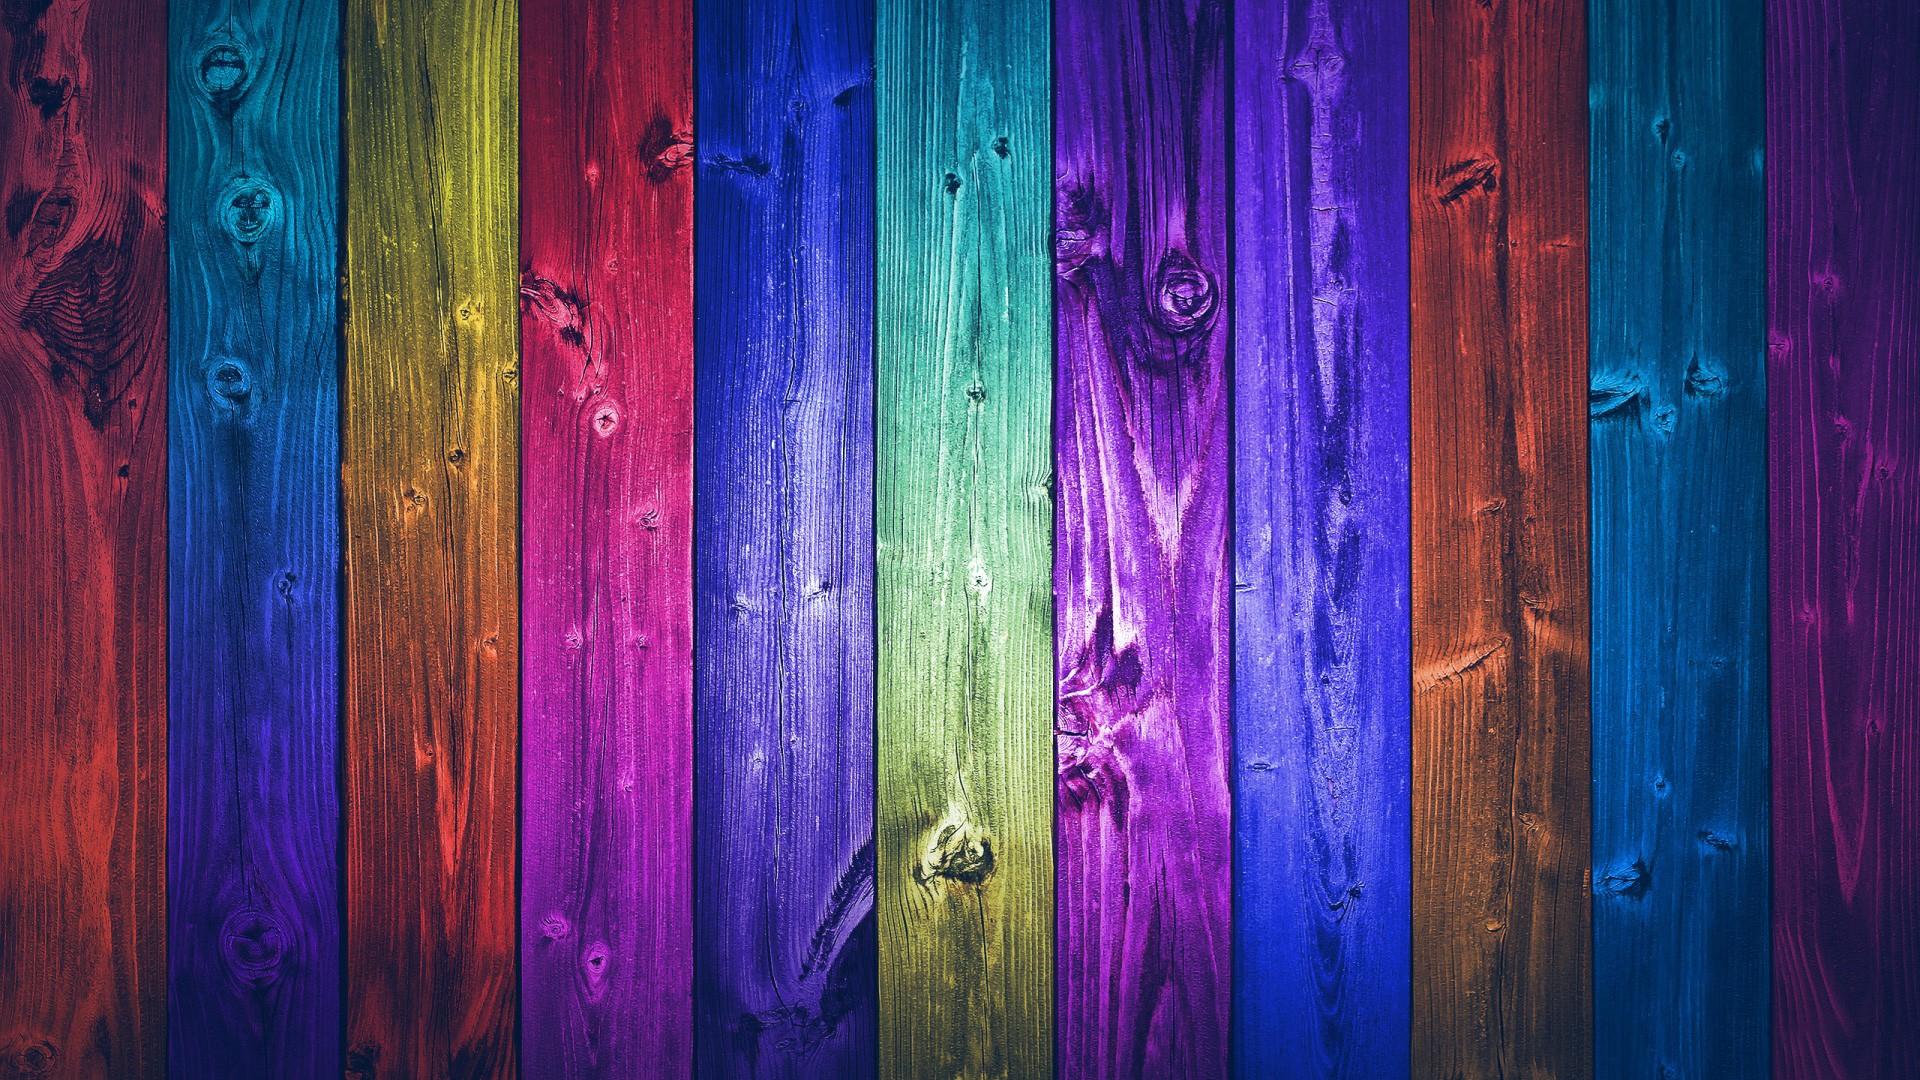 Colorful Wooden Plates Desktop Wallpaper 1920x1080